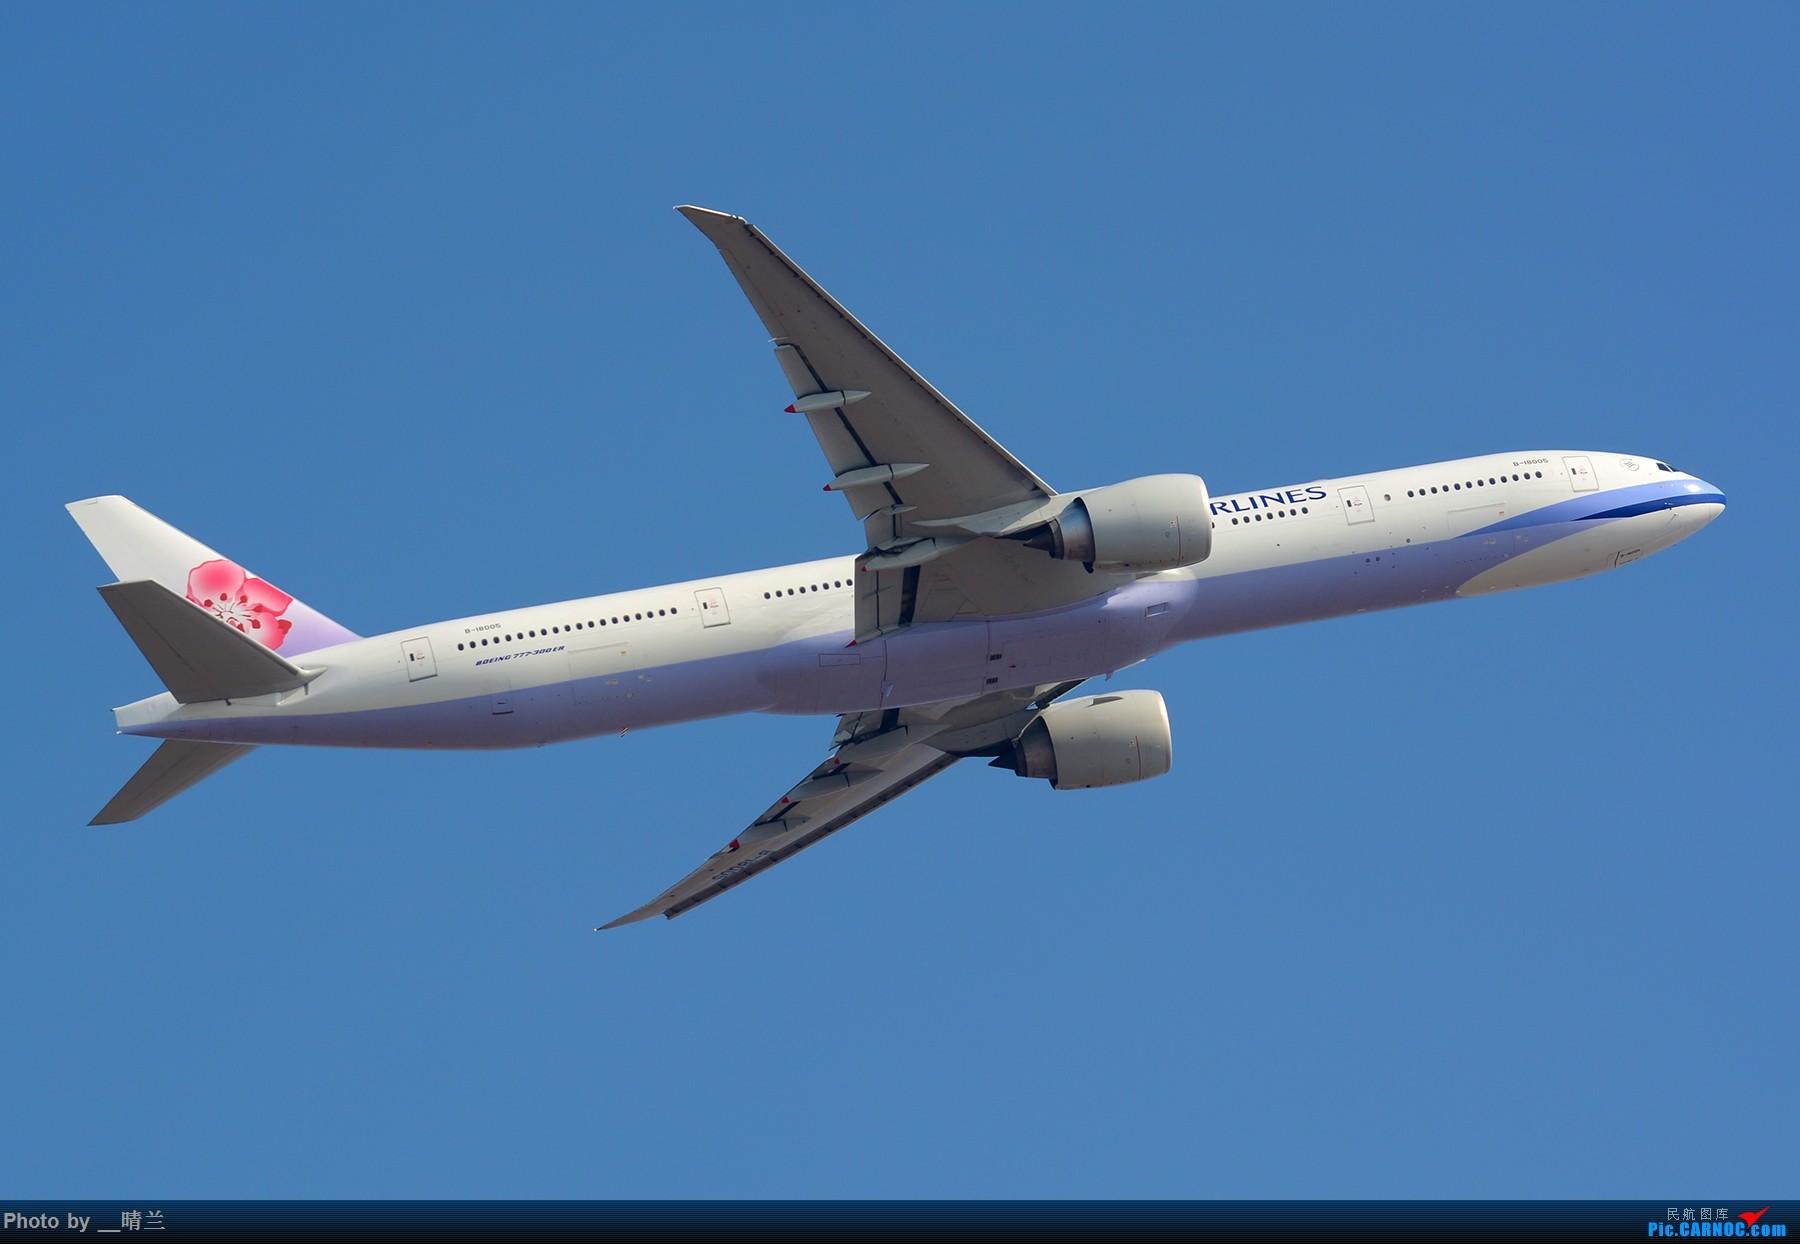 Re:[原创]【PVG】大年初二 新角度解锁 集齐7只77W 召唤748一枚!#祝各位飞友新的一年一飞冲天!# BOEING 777-300ER B-18005 中国上海浦东国际机场